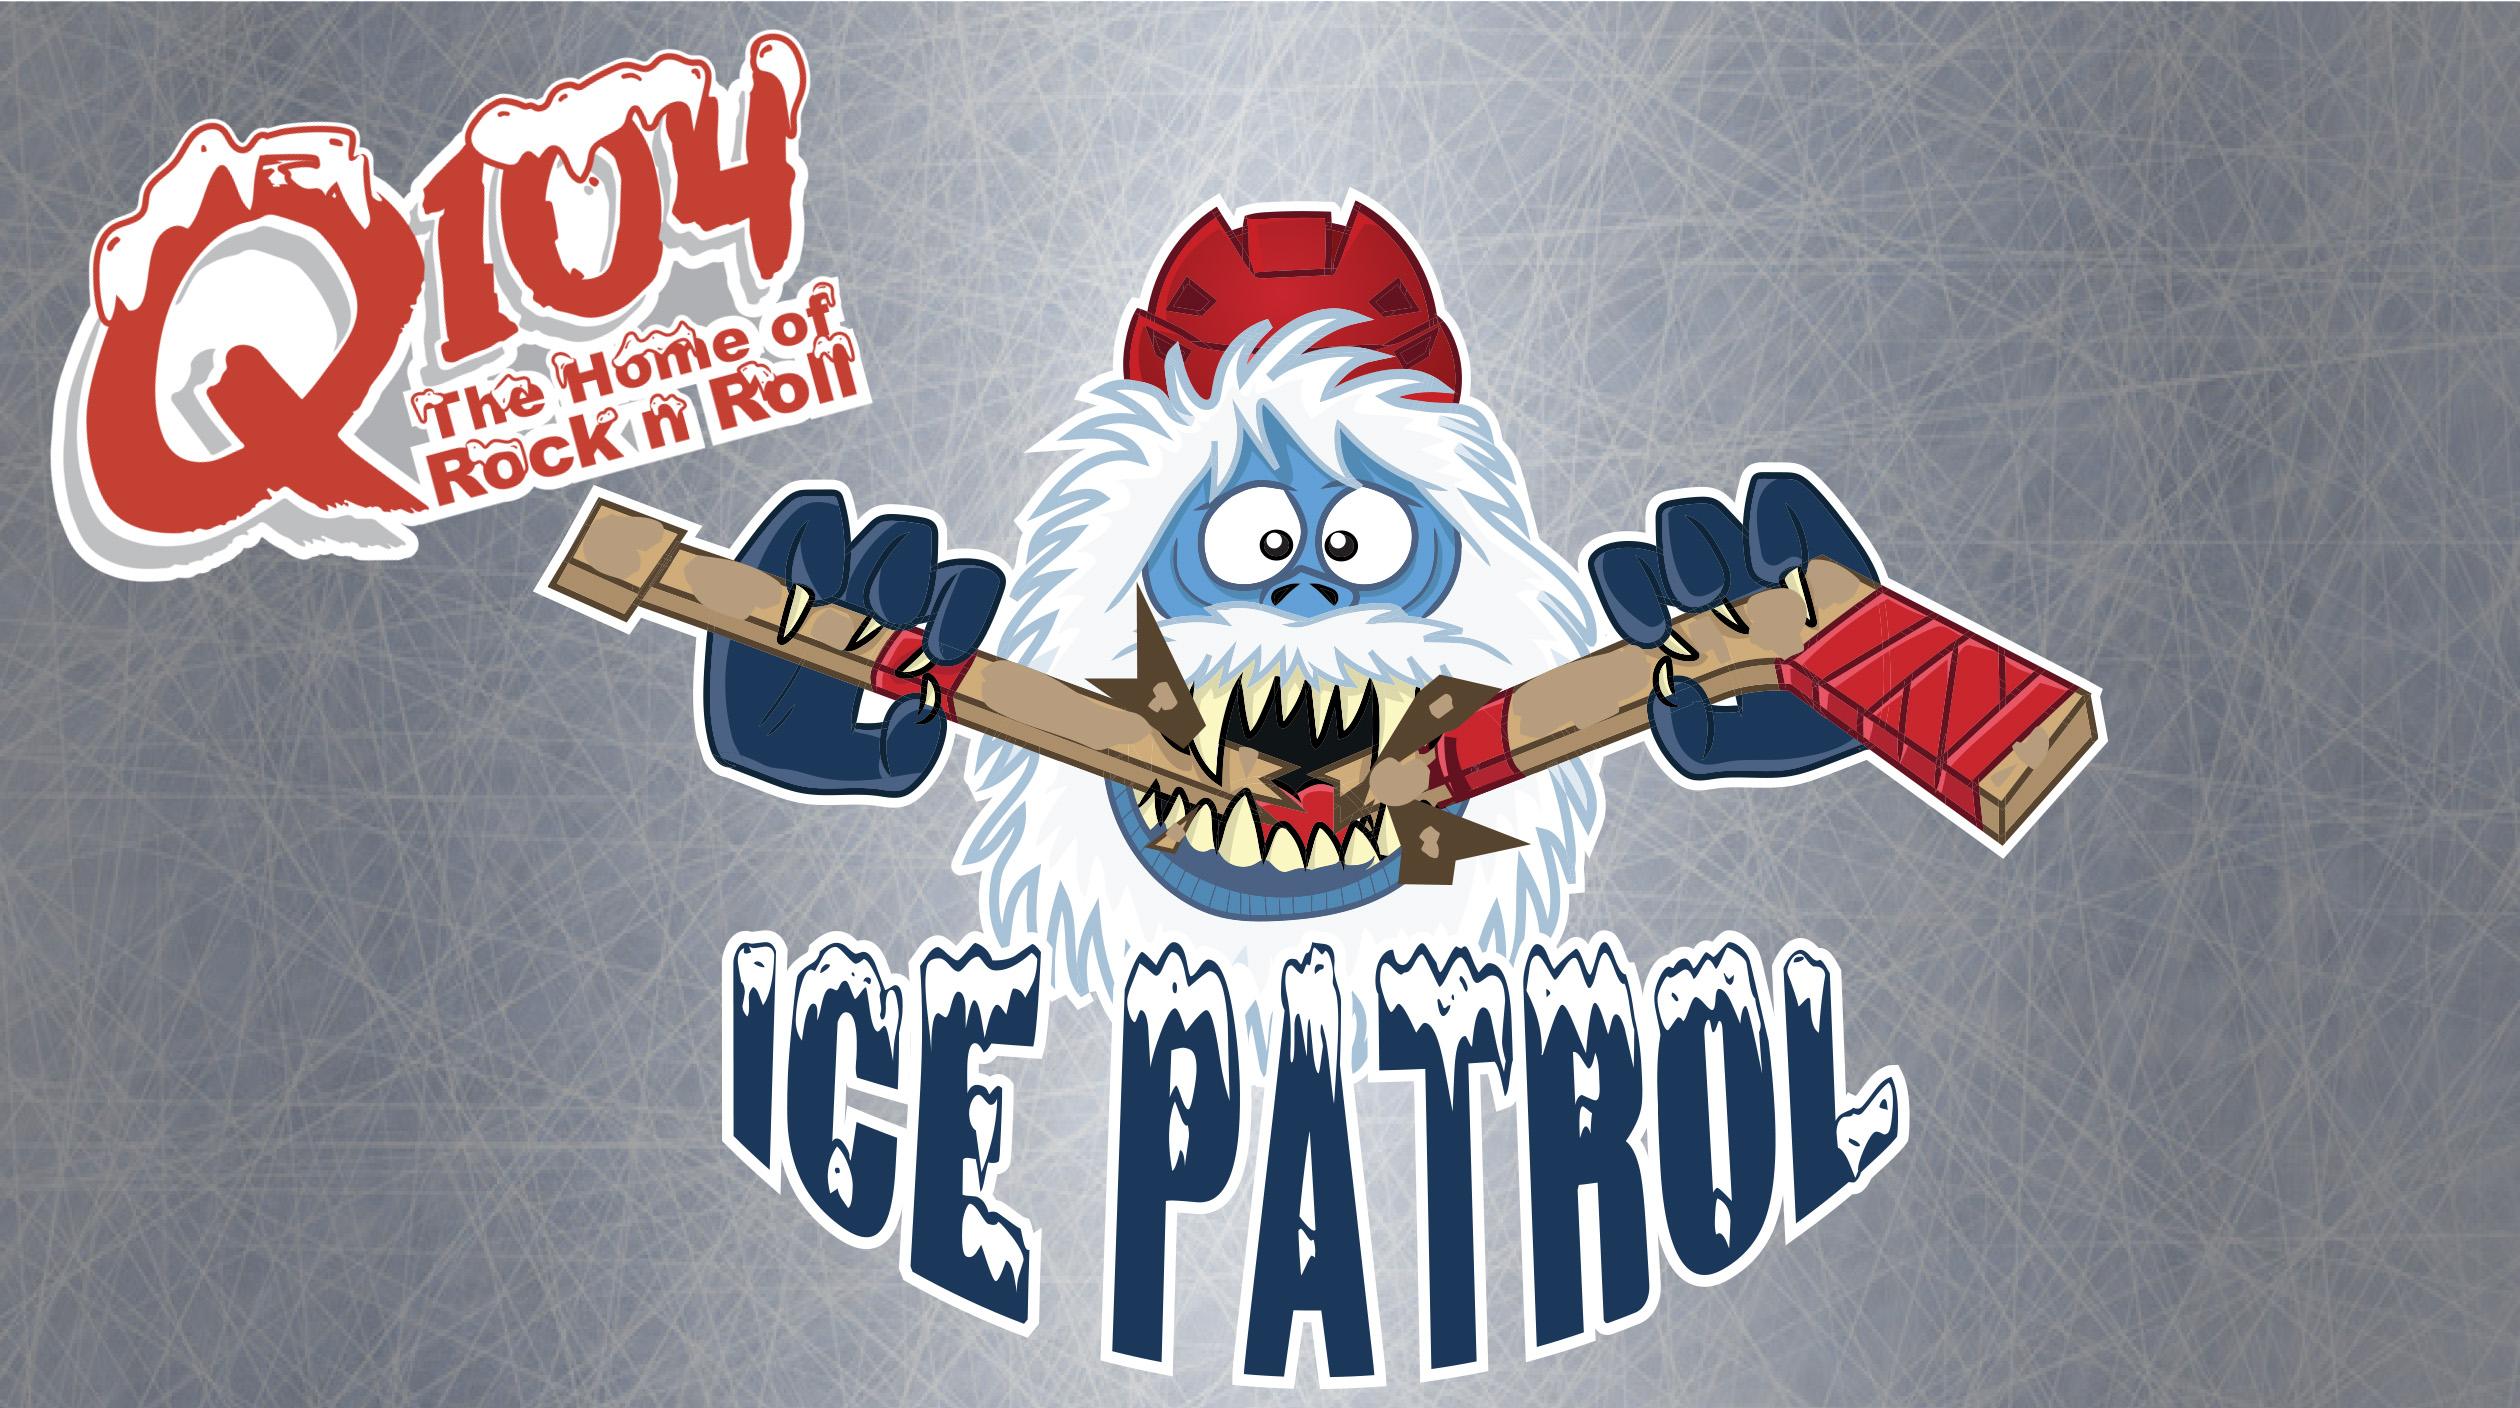 Feature: http://d803.cms.socastsrm.com/q104-ice-patrol/